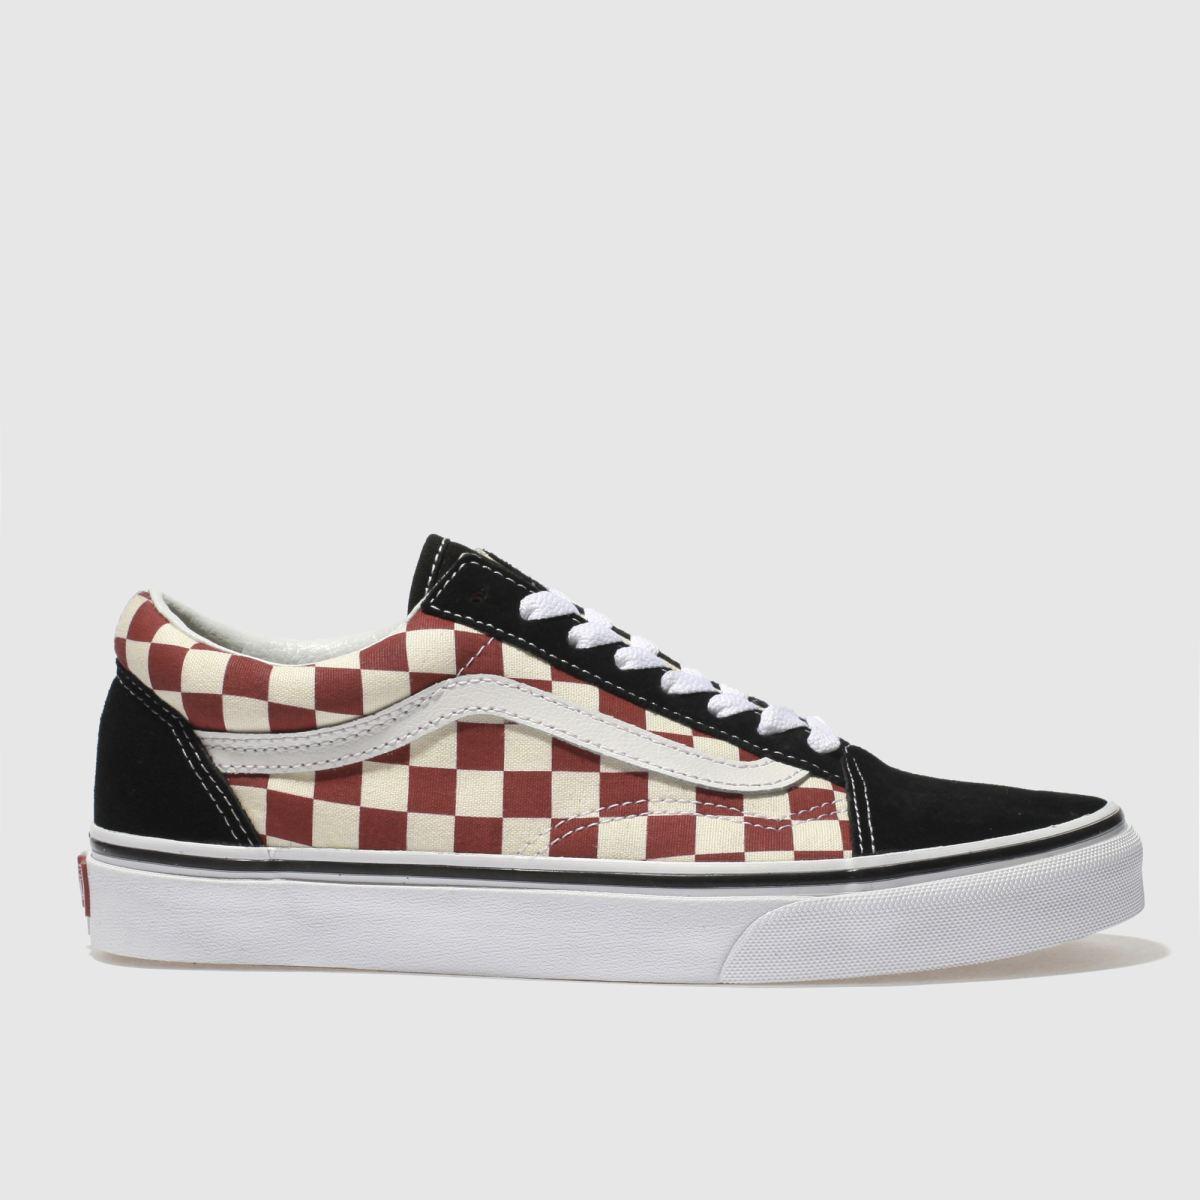 Vans White & Red Old Skool Checkerboard Trainers